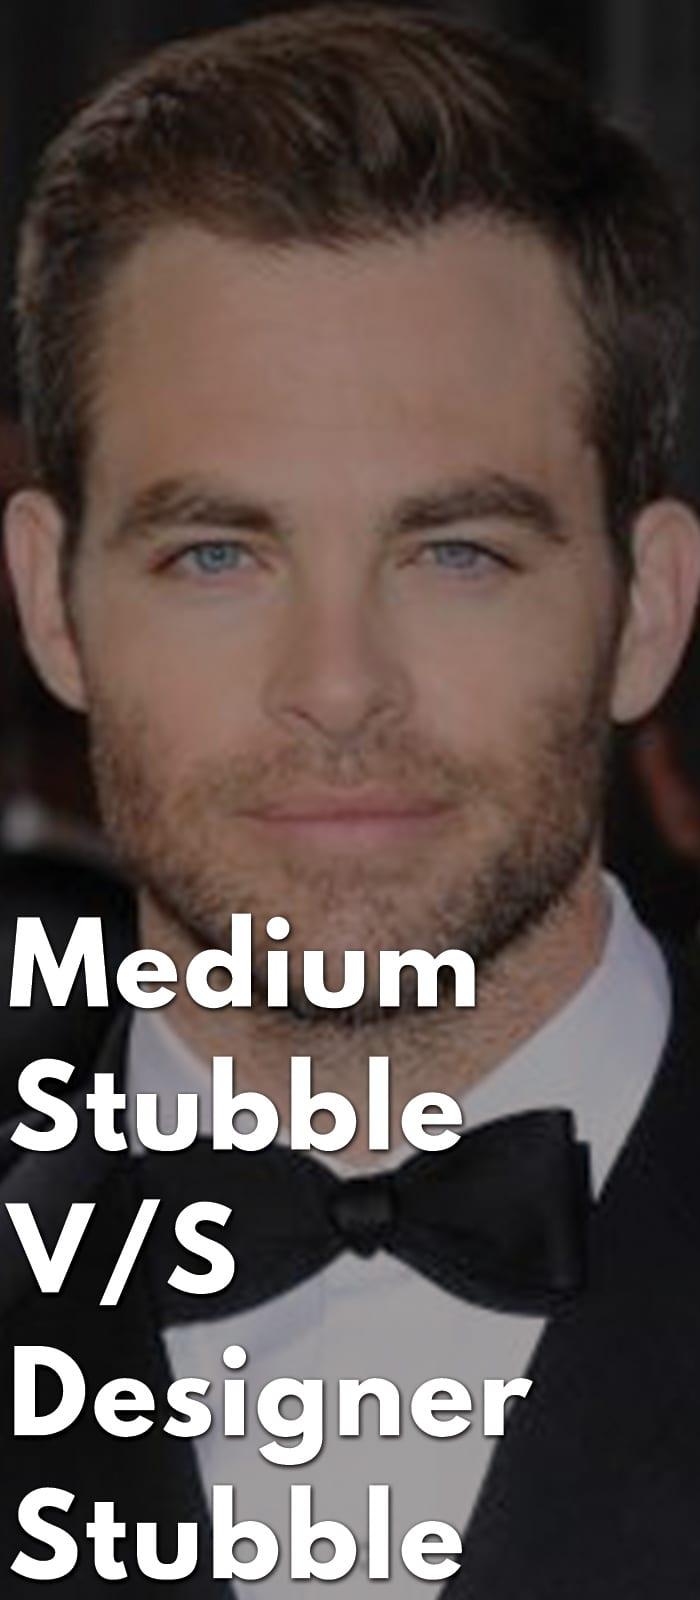 Medium-Stubble-&-Designer-Stubble.